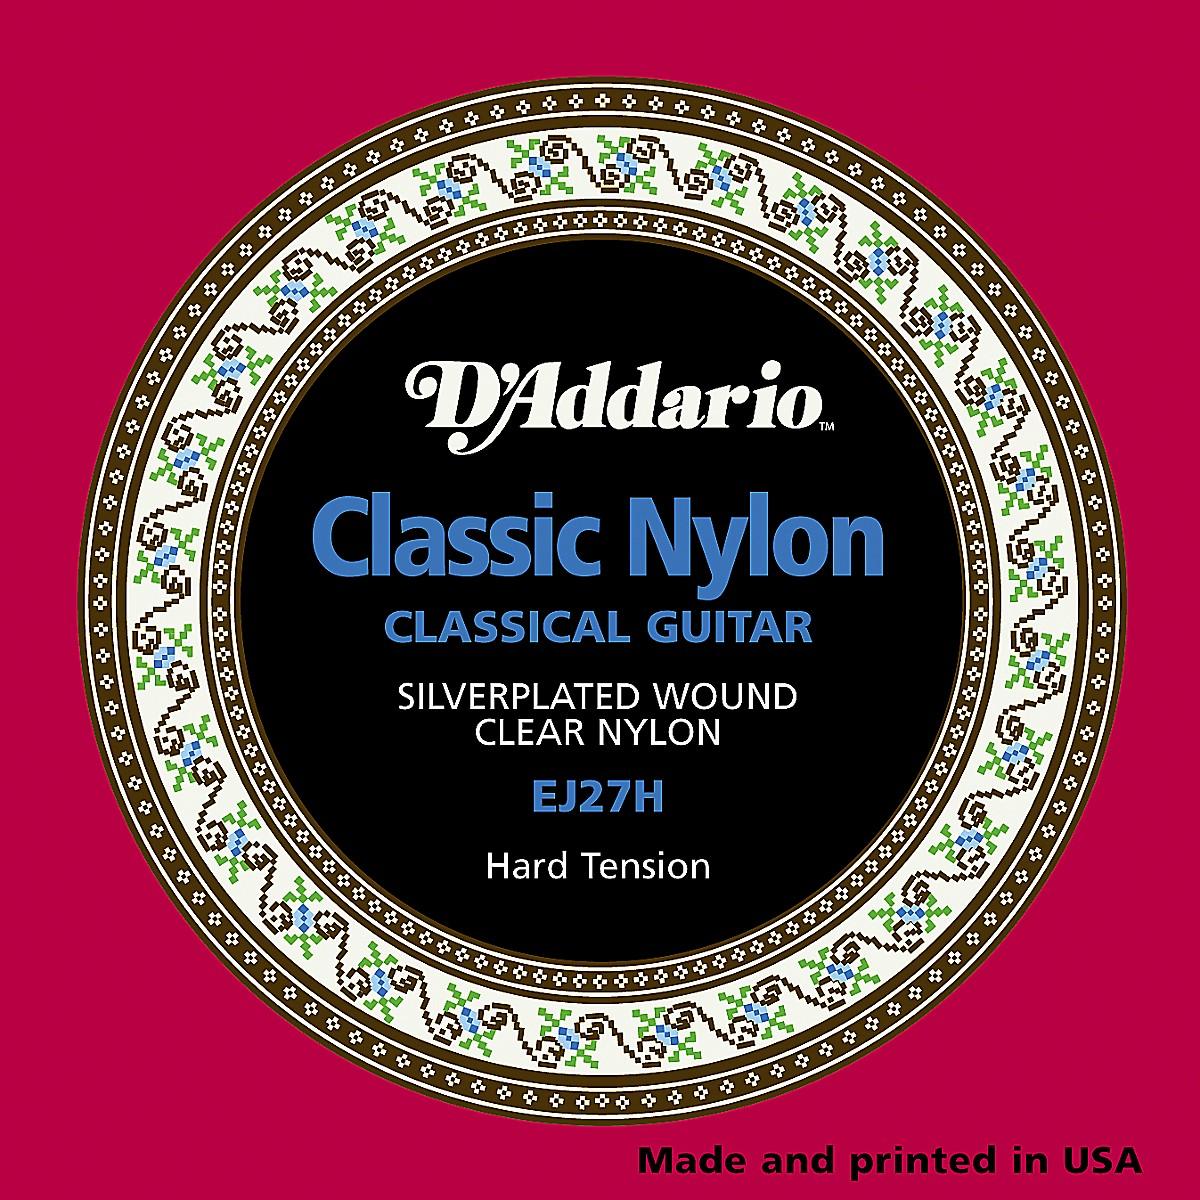 D'Addario EJ27H Classical Guitar Strings Hard Tension